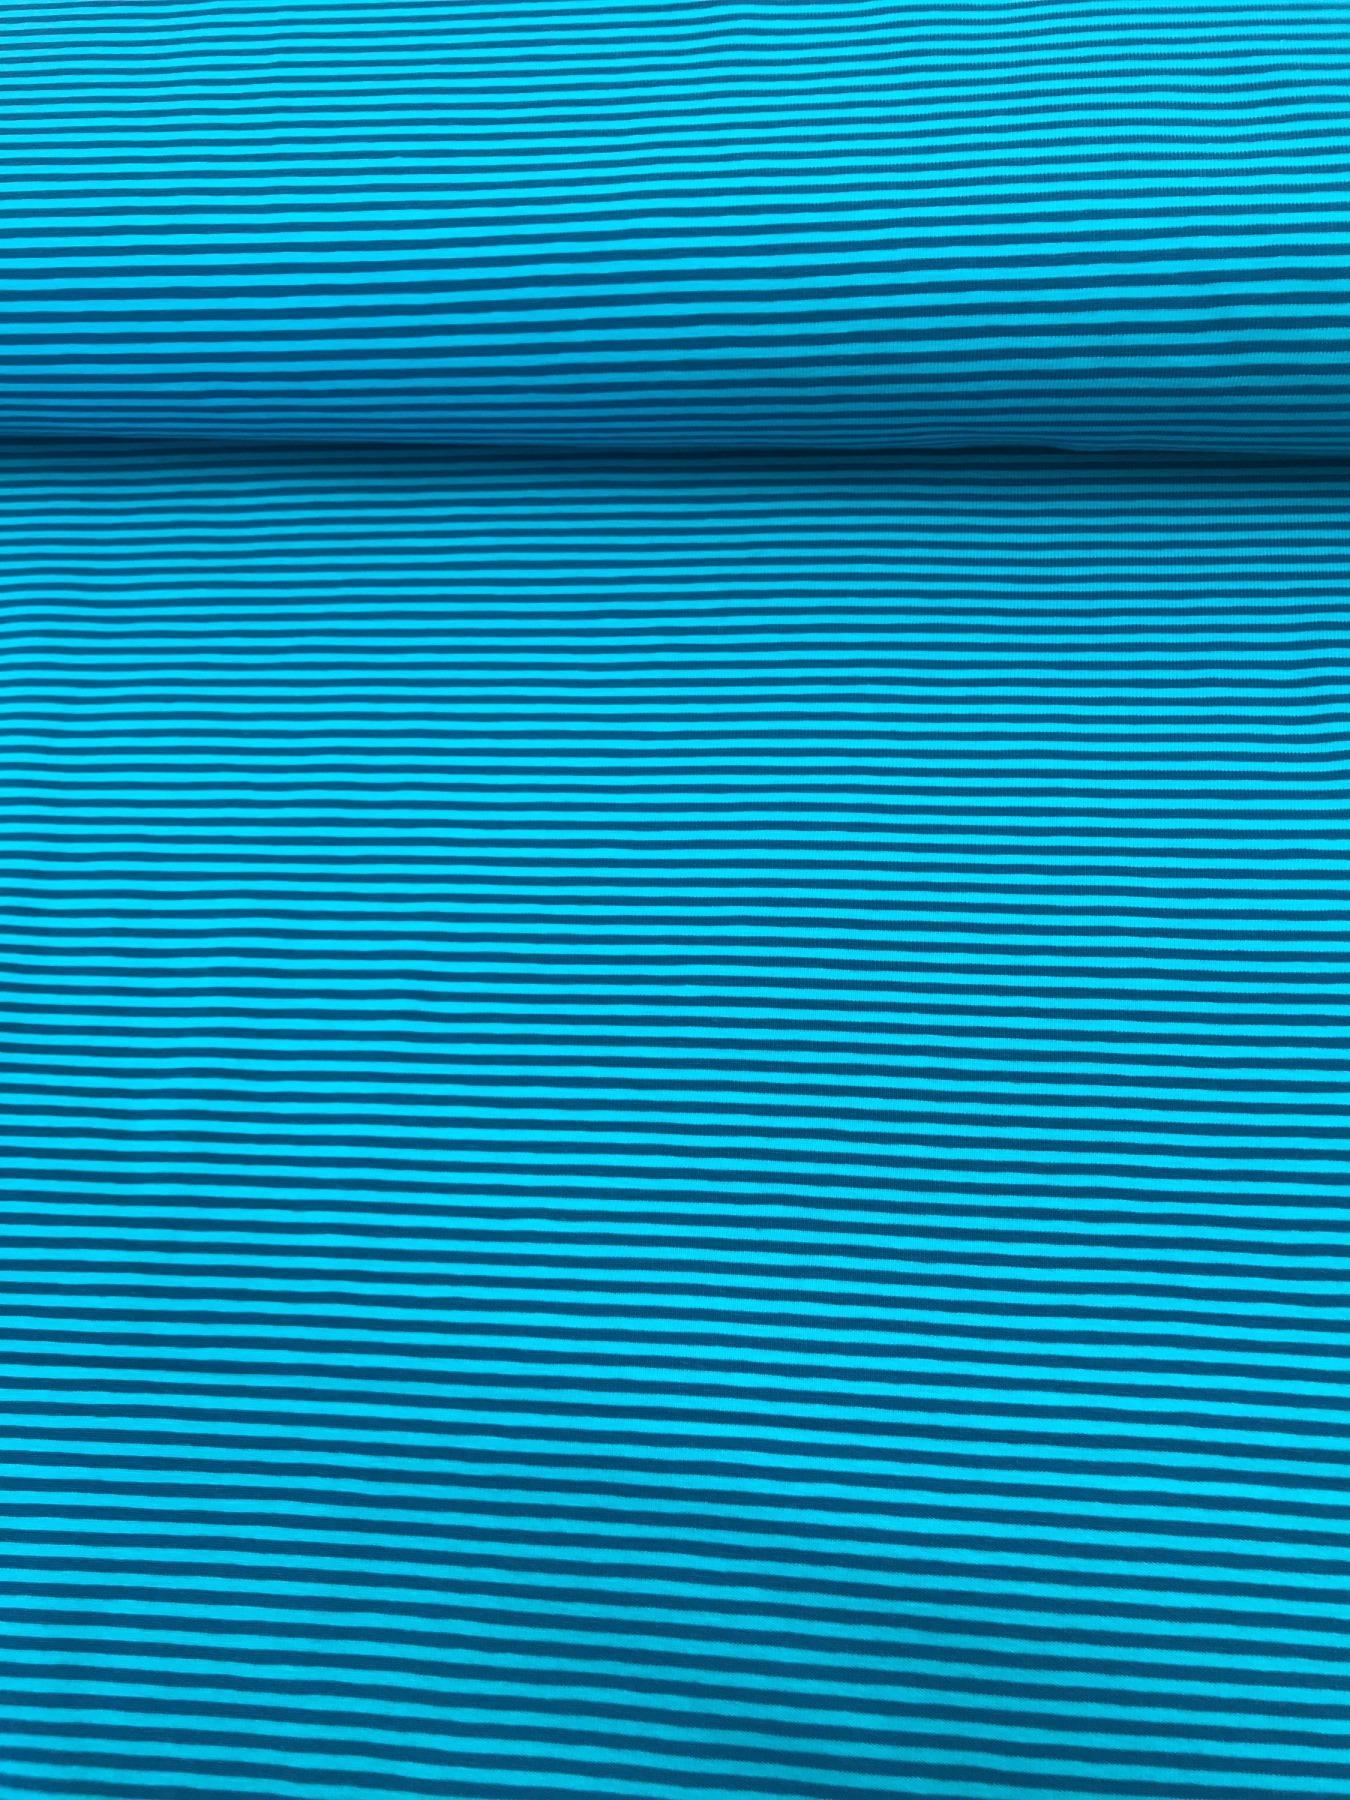 Baumwoll-Jersey Ringel blau-Türkis 2